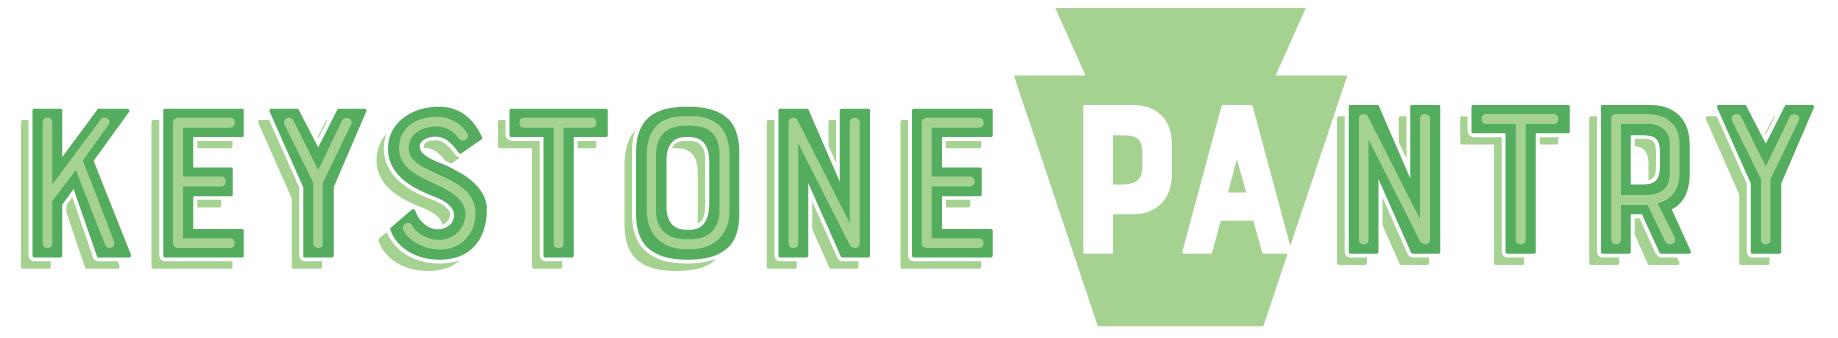 greenkeystonepantrylogo-1-.png